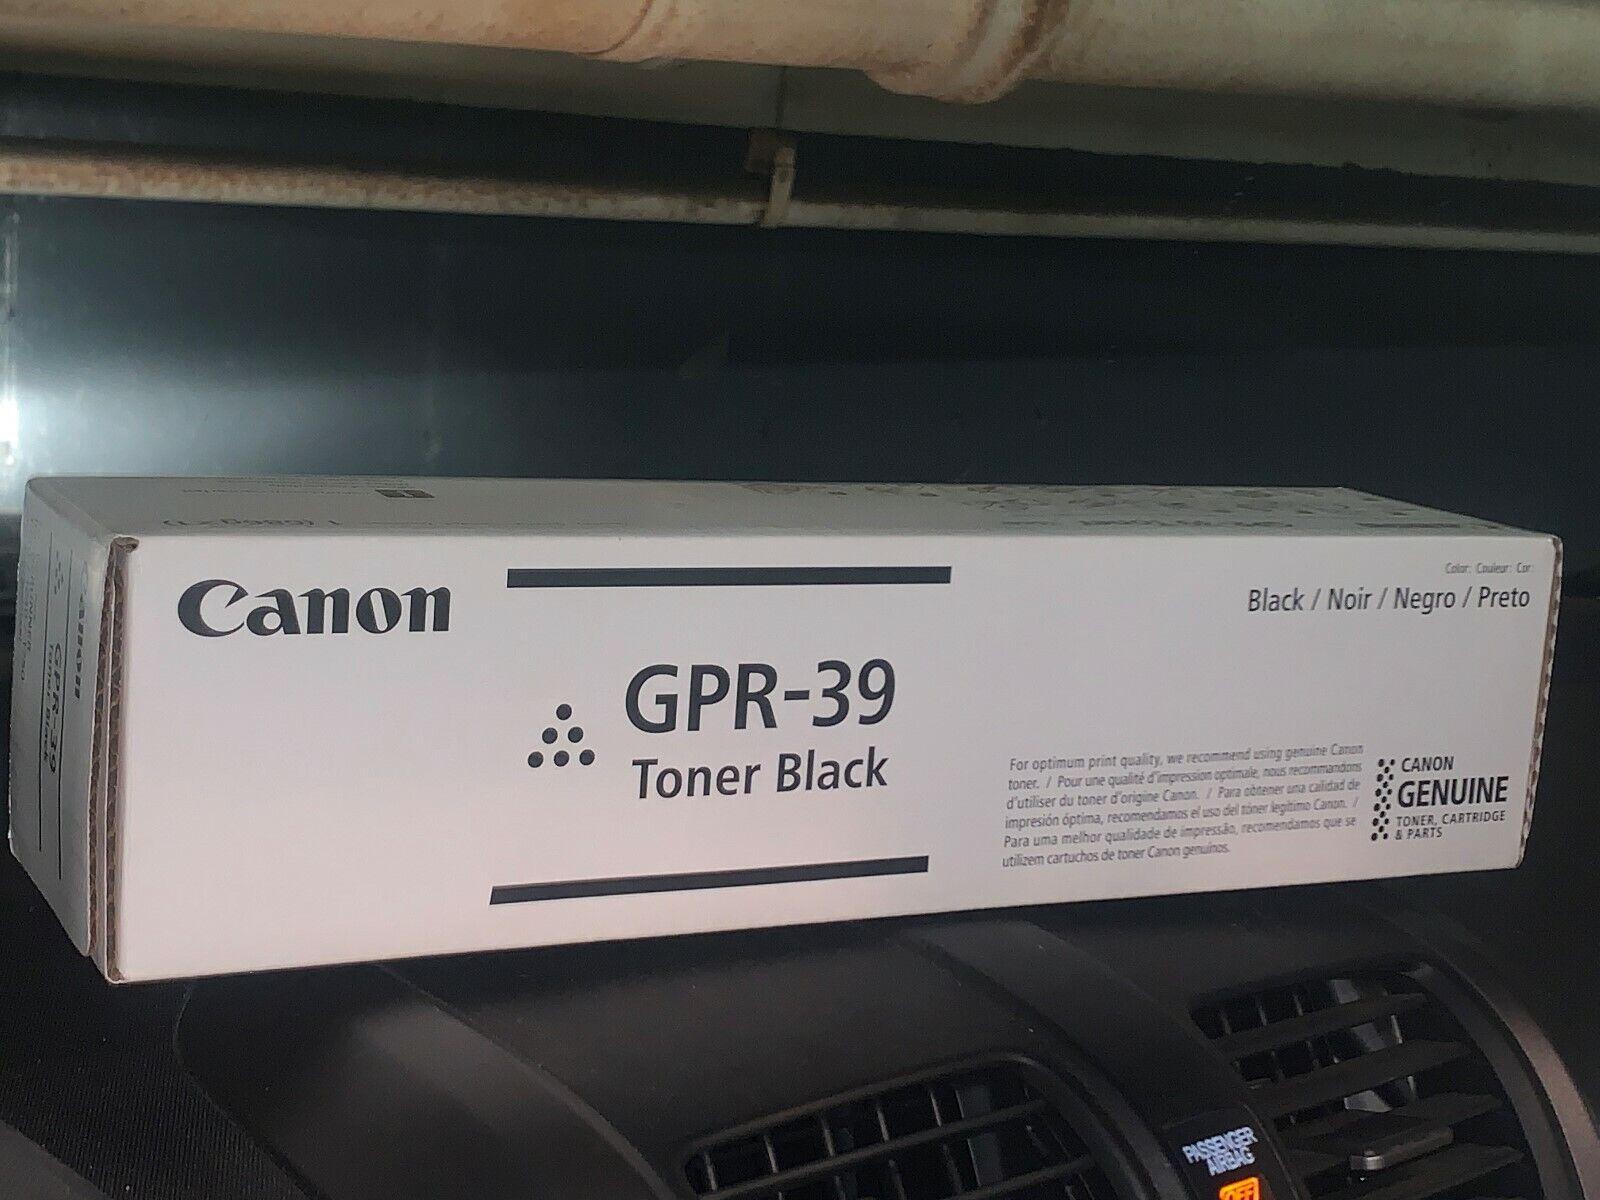 Canon CNMGPR39 Toner Cartridge, Black, Laser, 15100 Page, 1